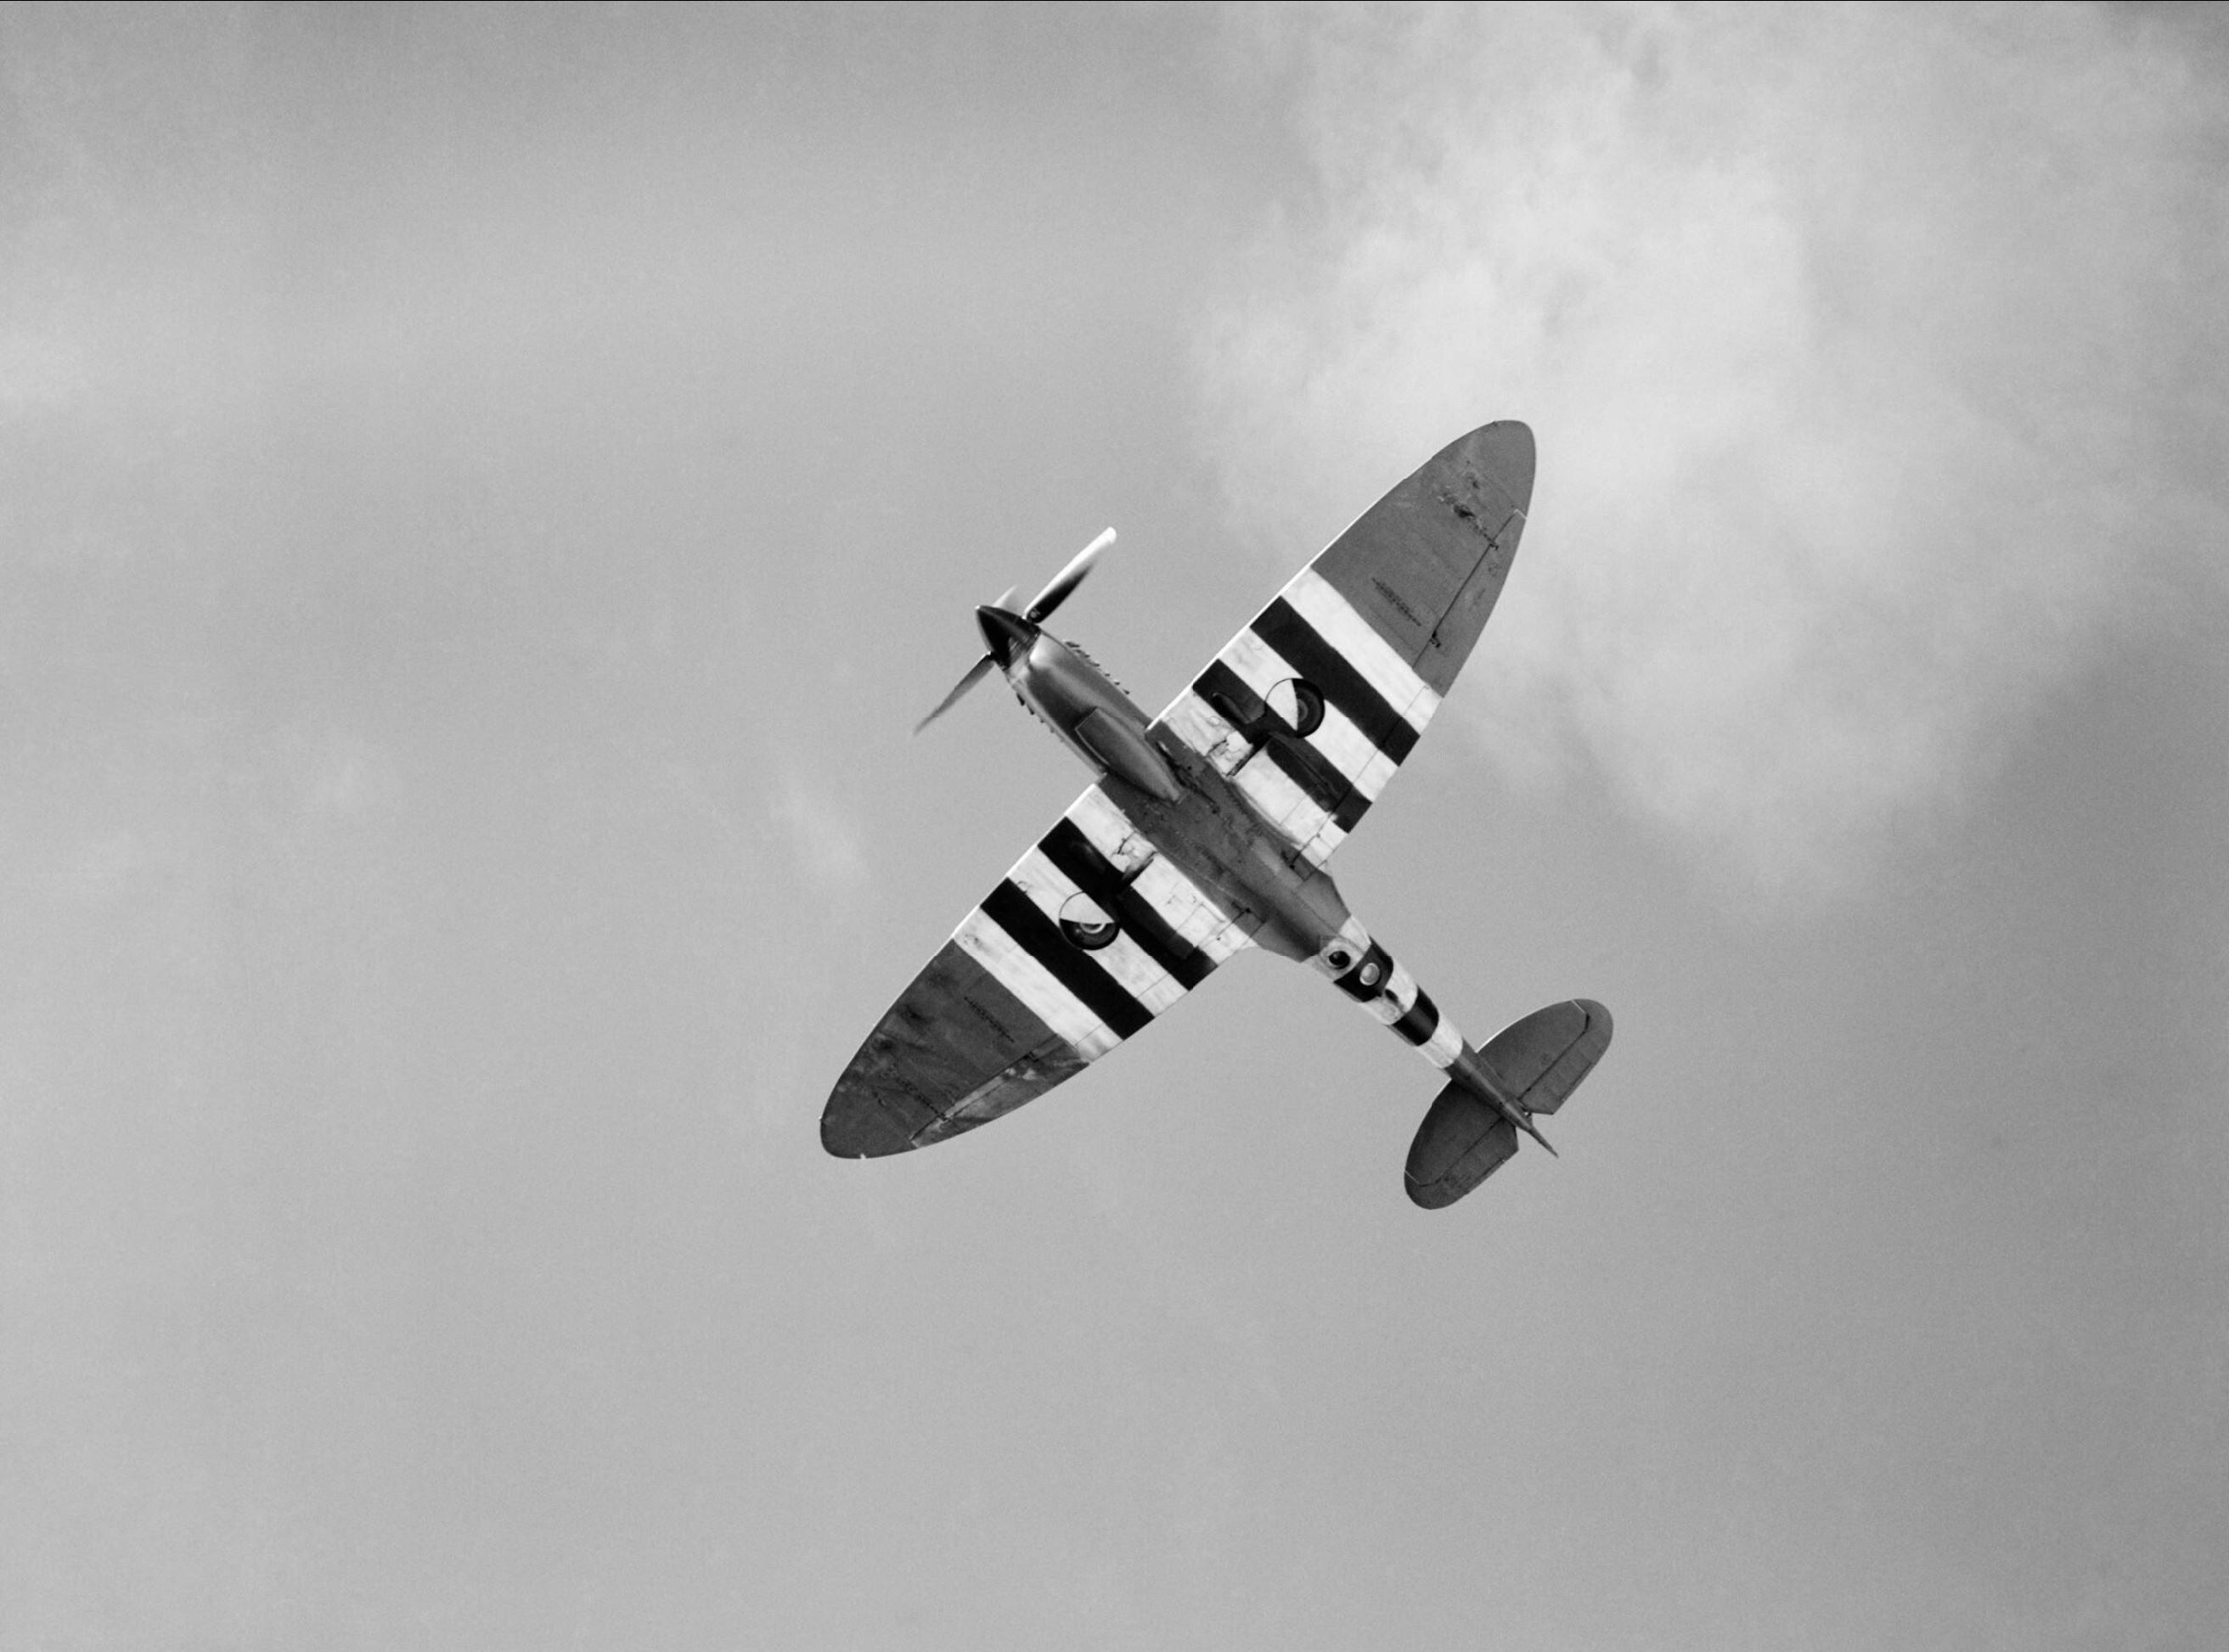 Spitfire PRXI RAF 541Sqn A PL775 based at Benson Oxfordshire 1944 IWM CH13491